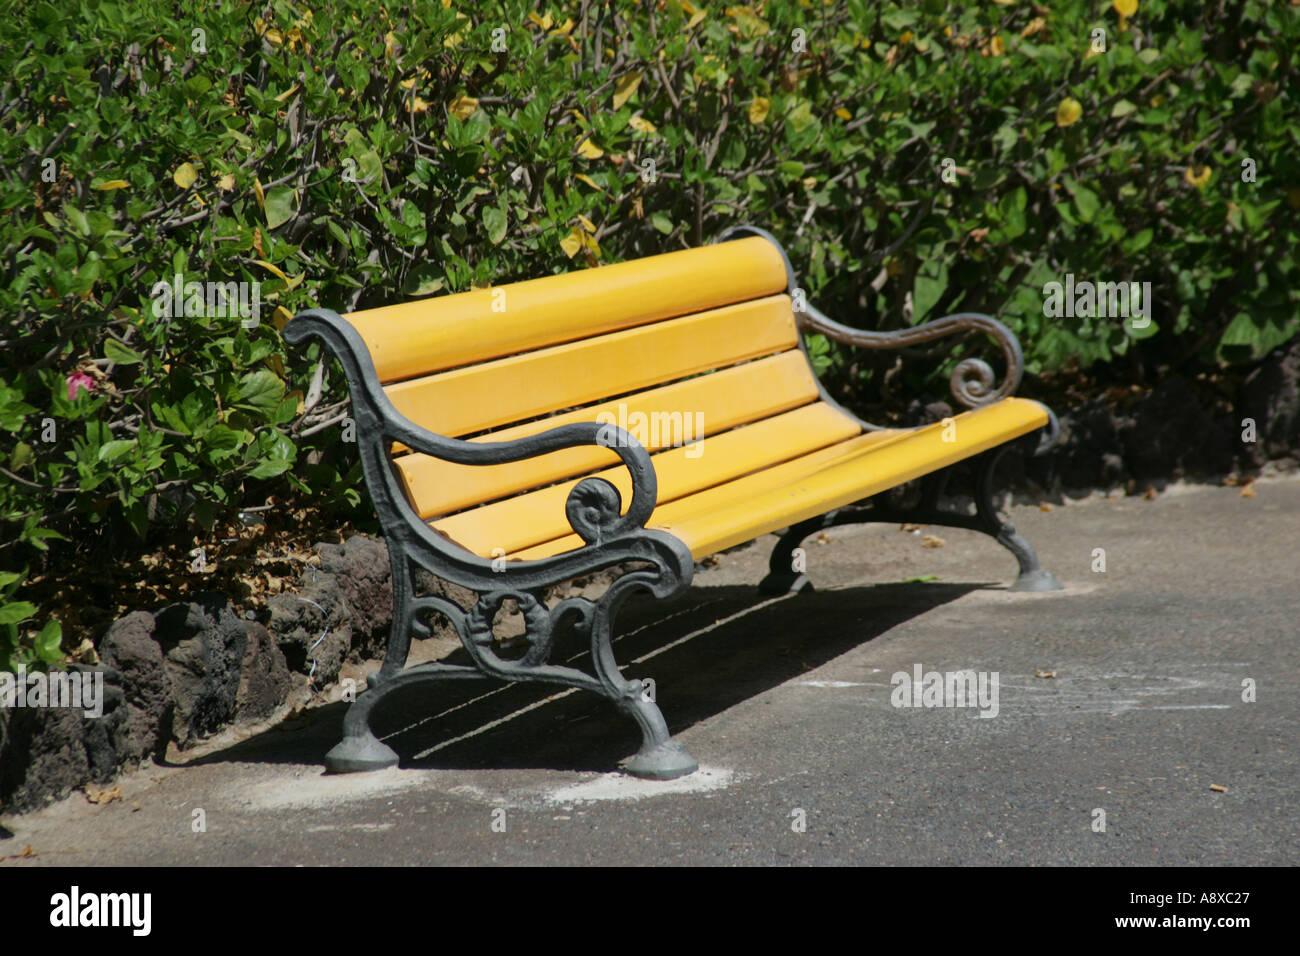 9b4df75fdebf A Yellow Park Bench Stock Photo  2272294 - Alamy